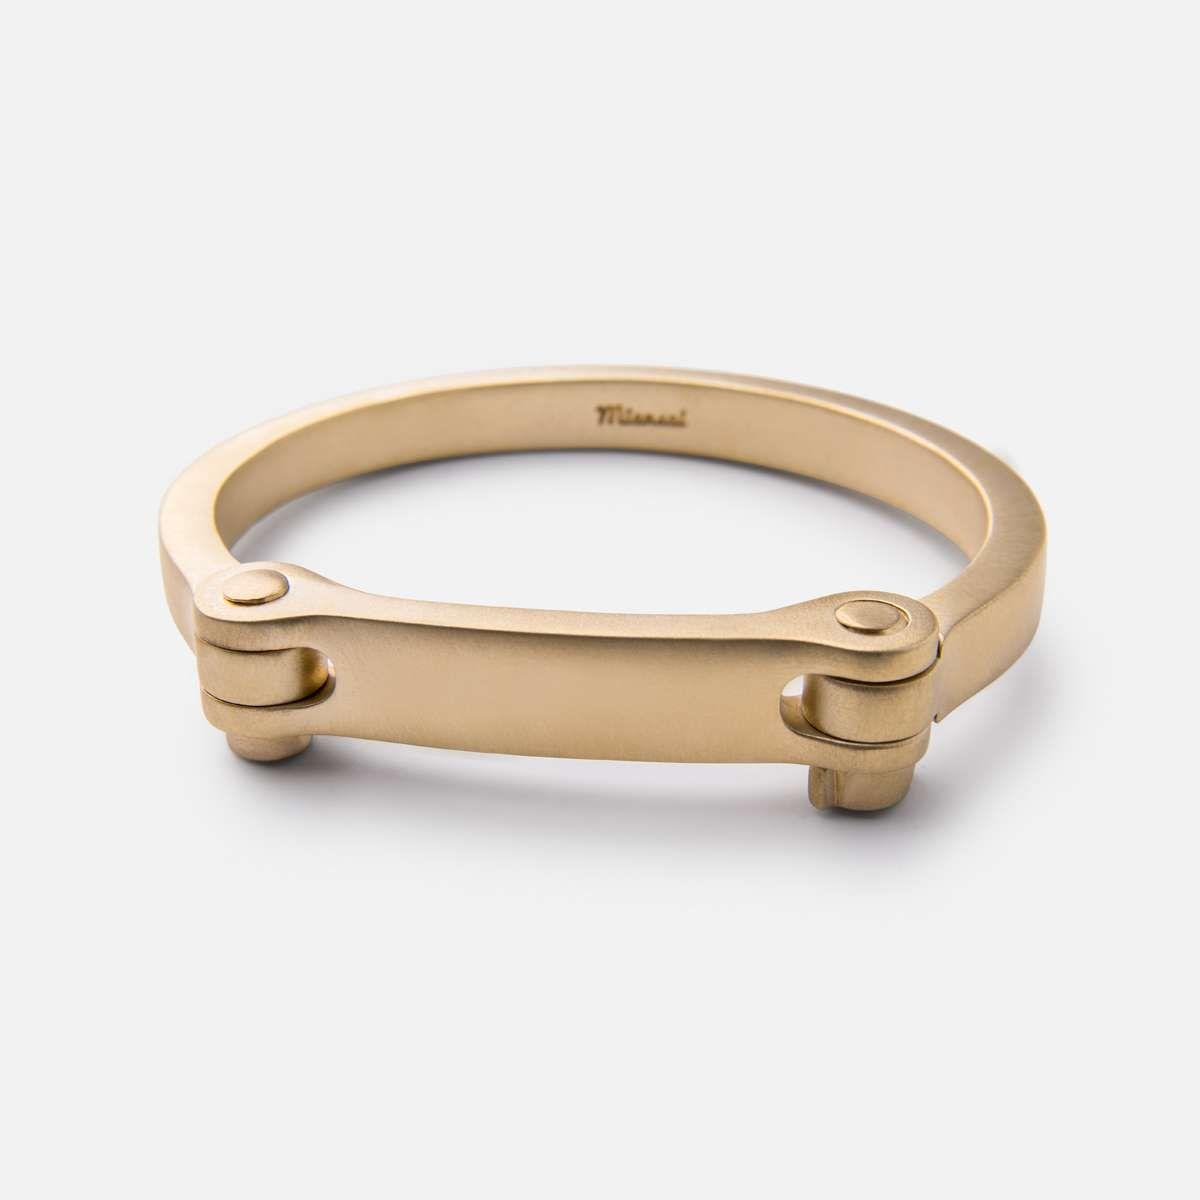 Bolt Cuff Bracelet Br Miansai